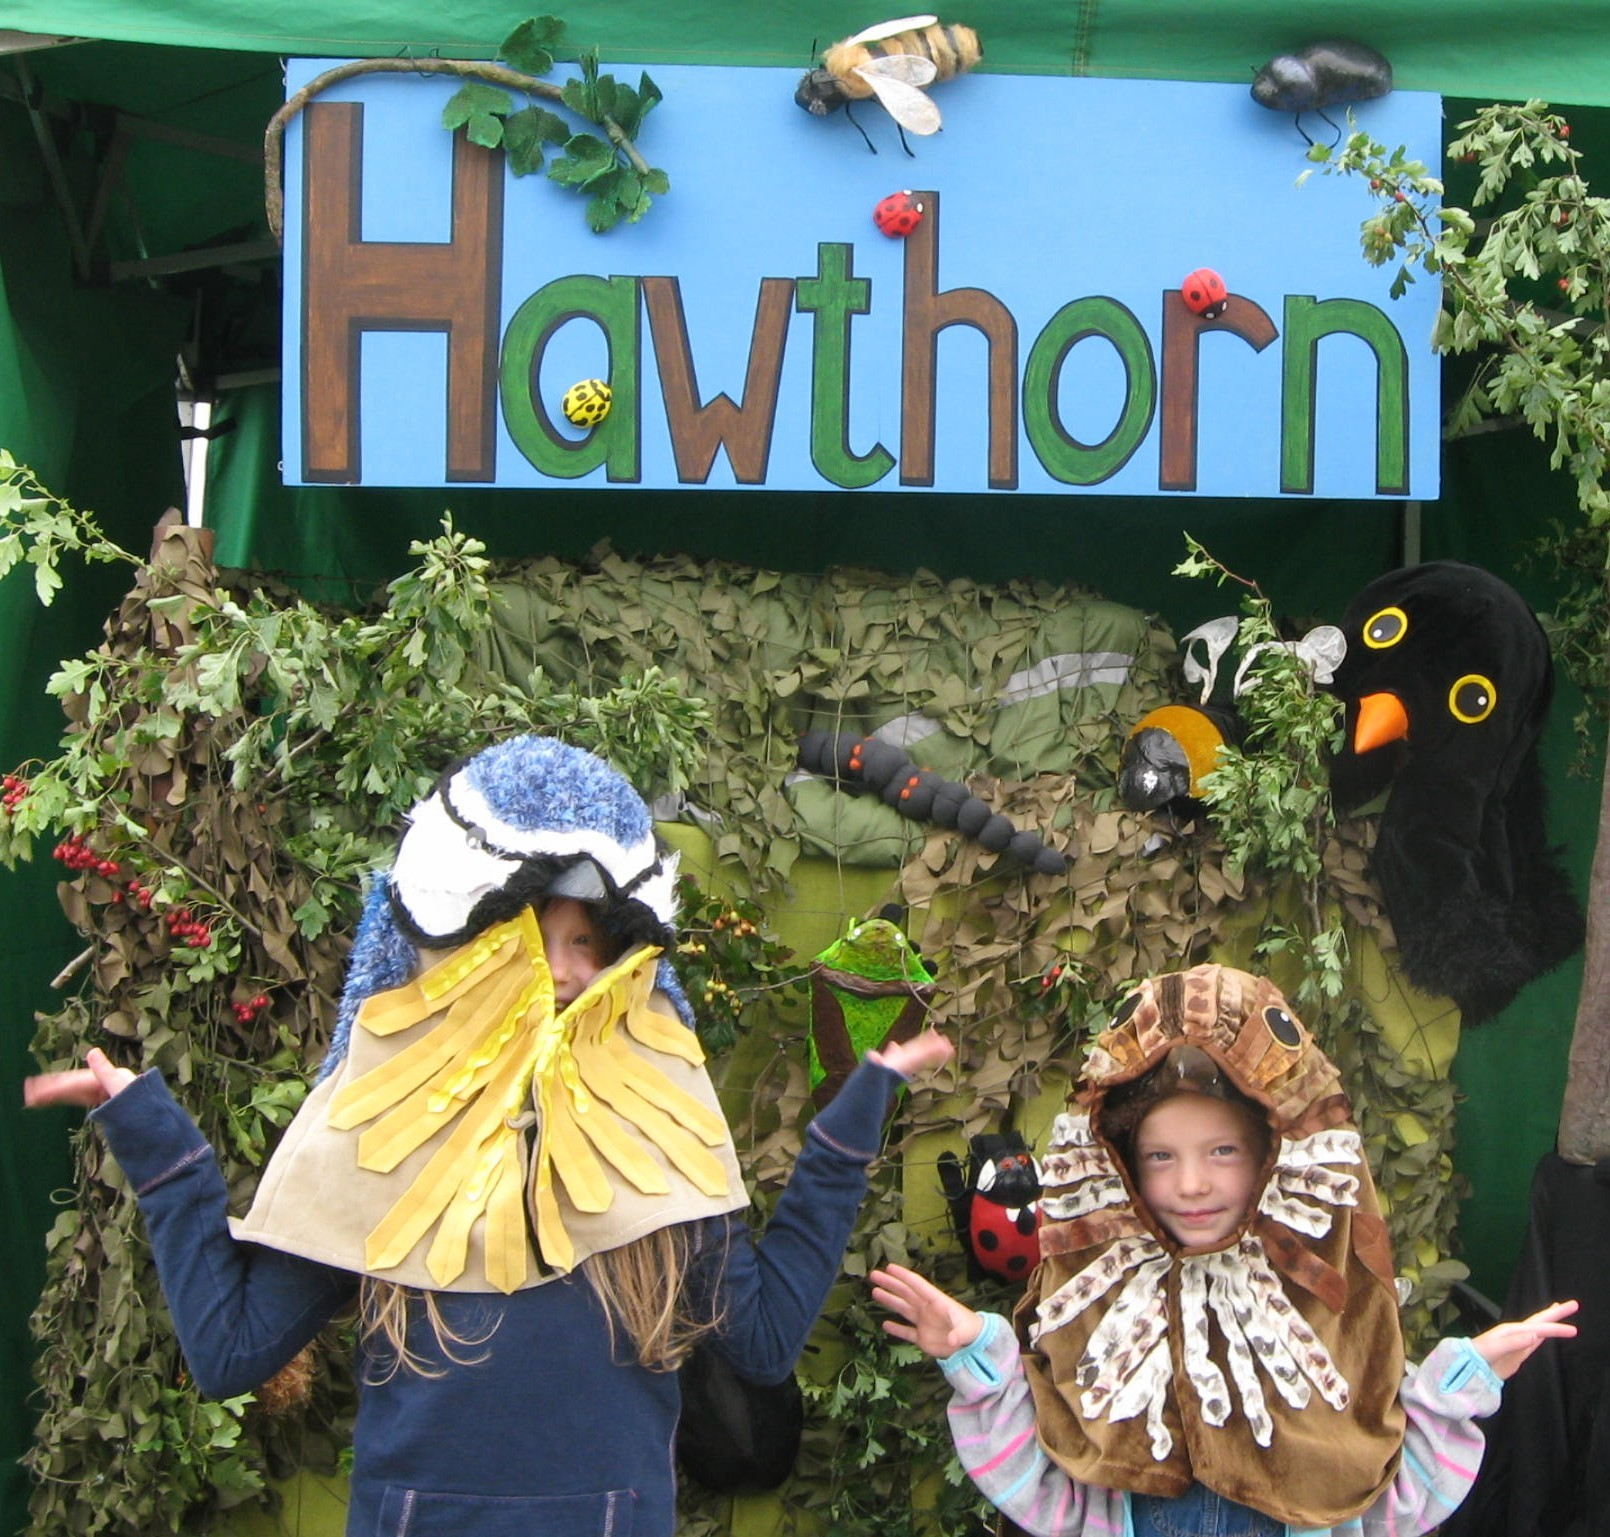 Ludlow Hawthorn Hedge